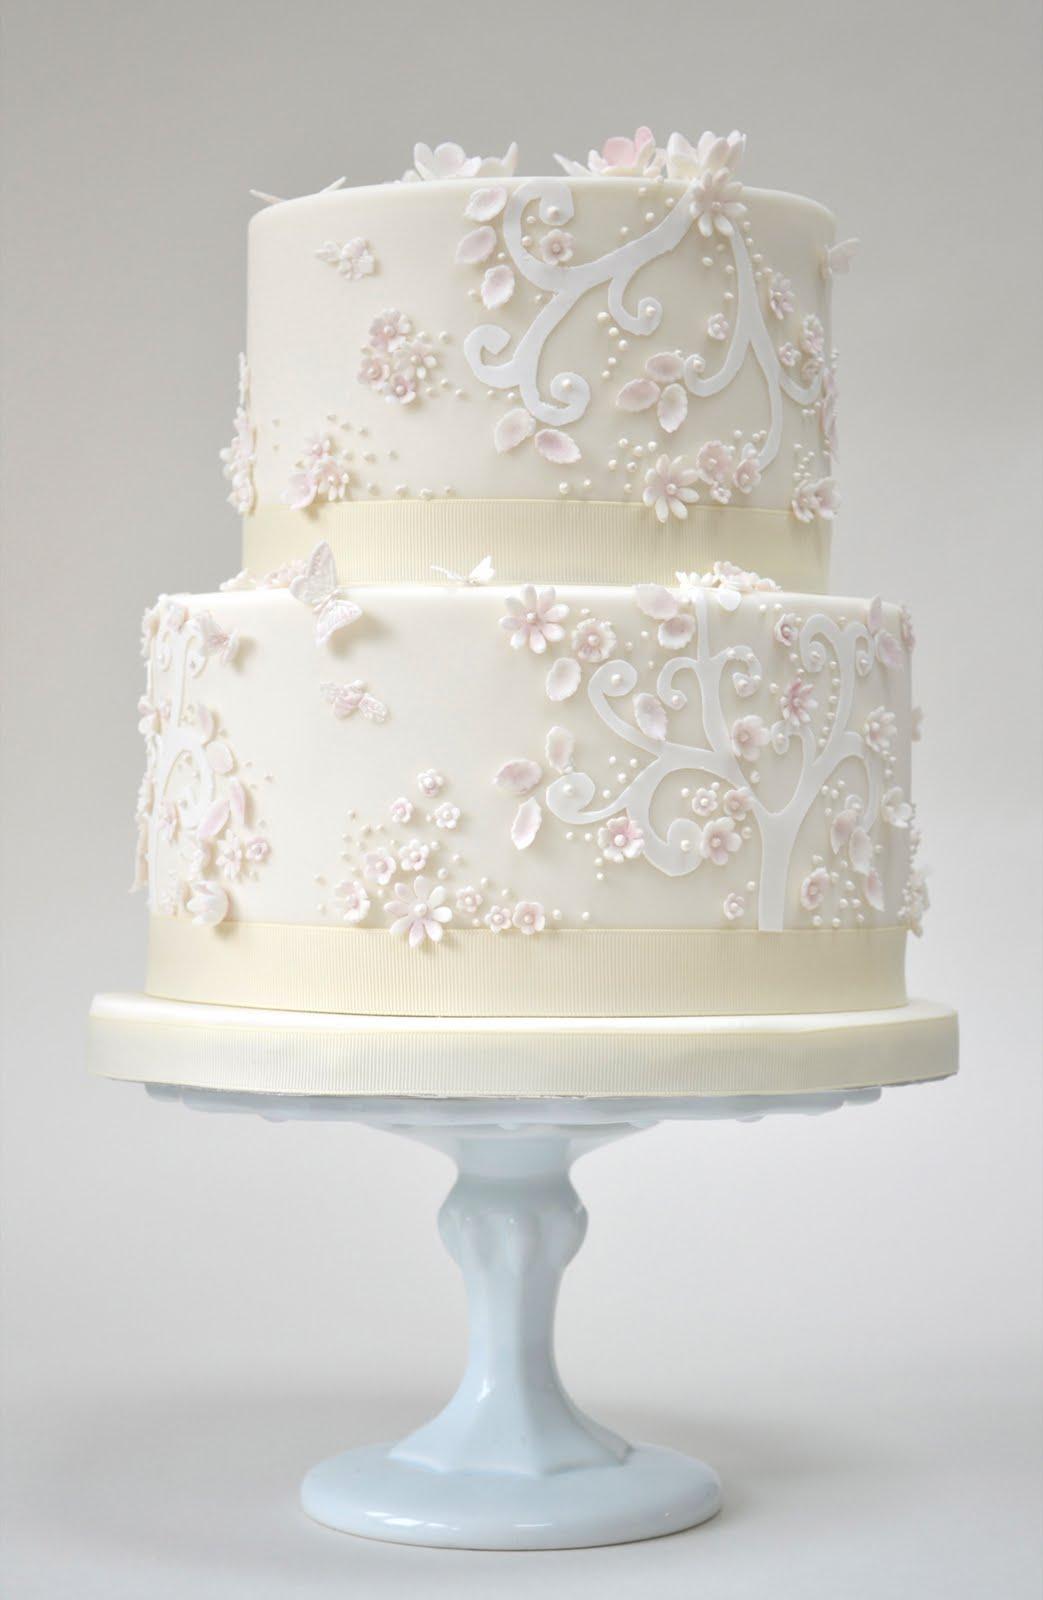 Rosalind Miller Cakes Pink Fairytale wedding Cake